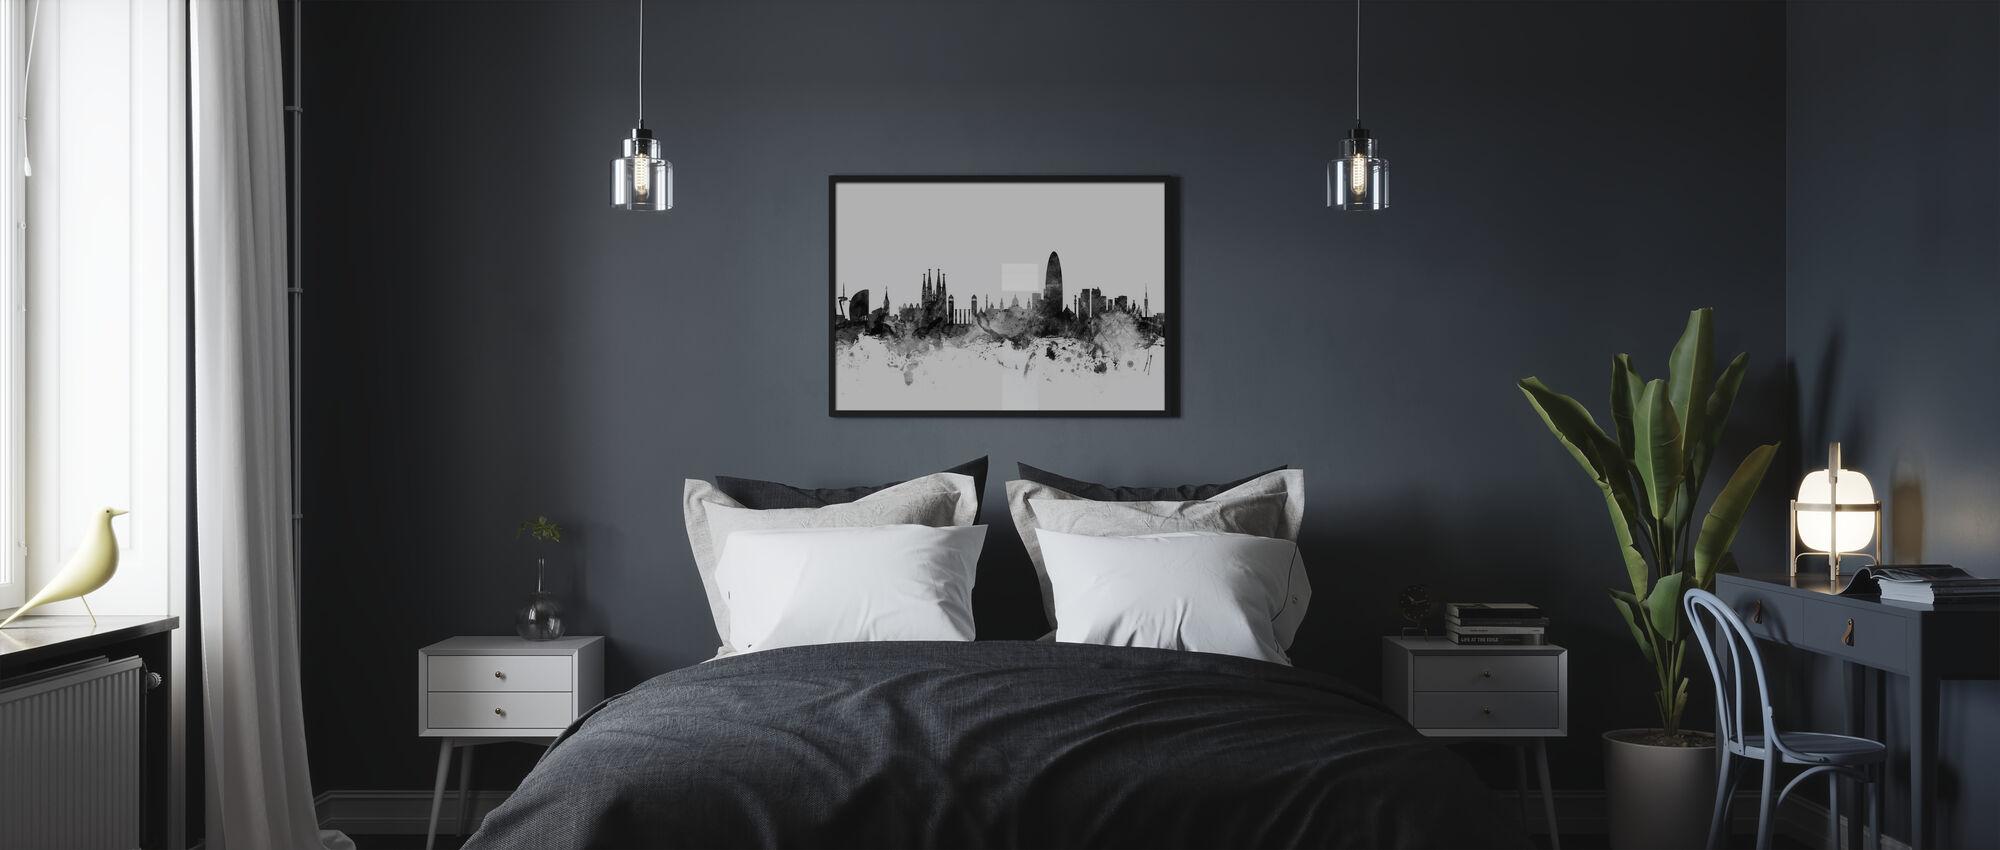 Barcelona Skyline Black - Poster - Bedroom